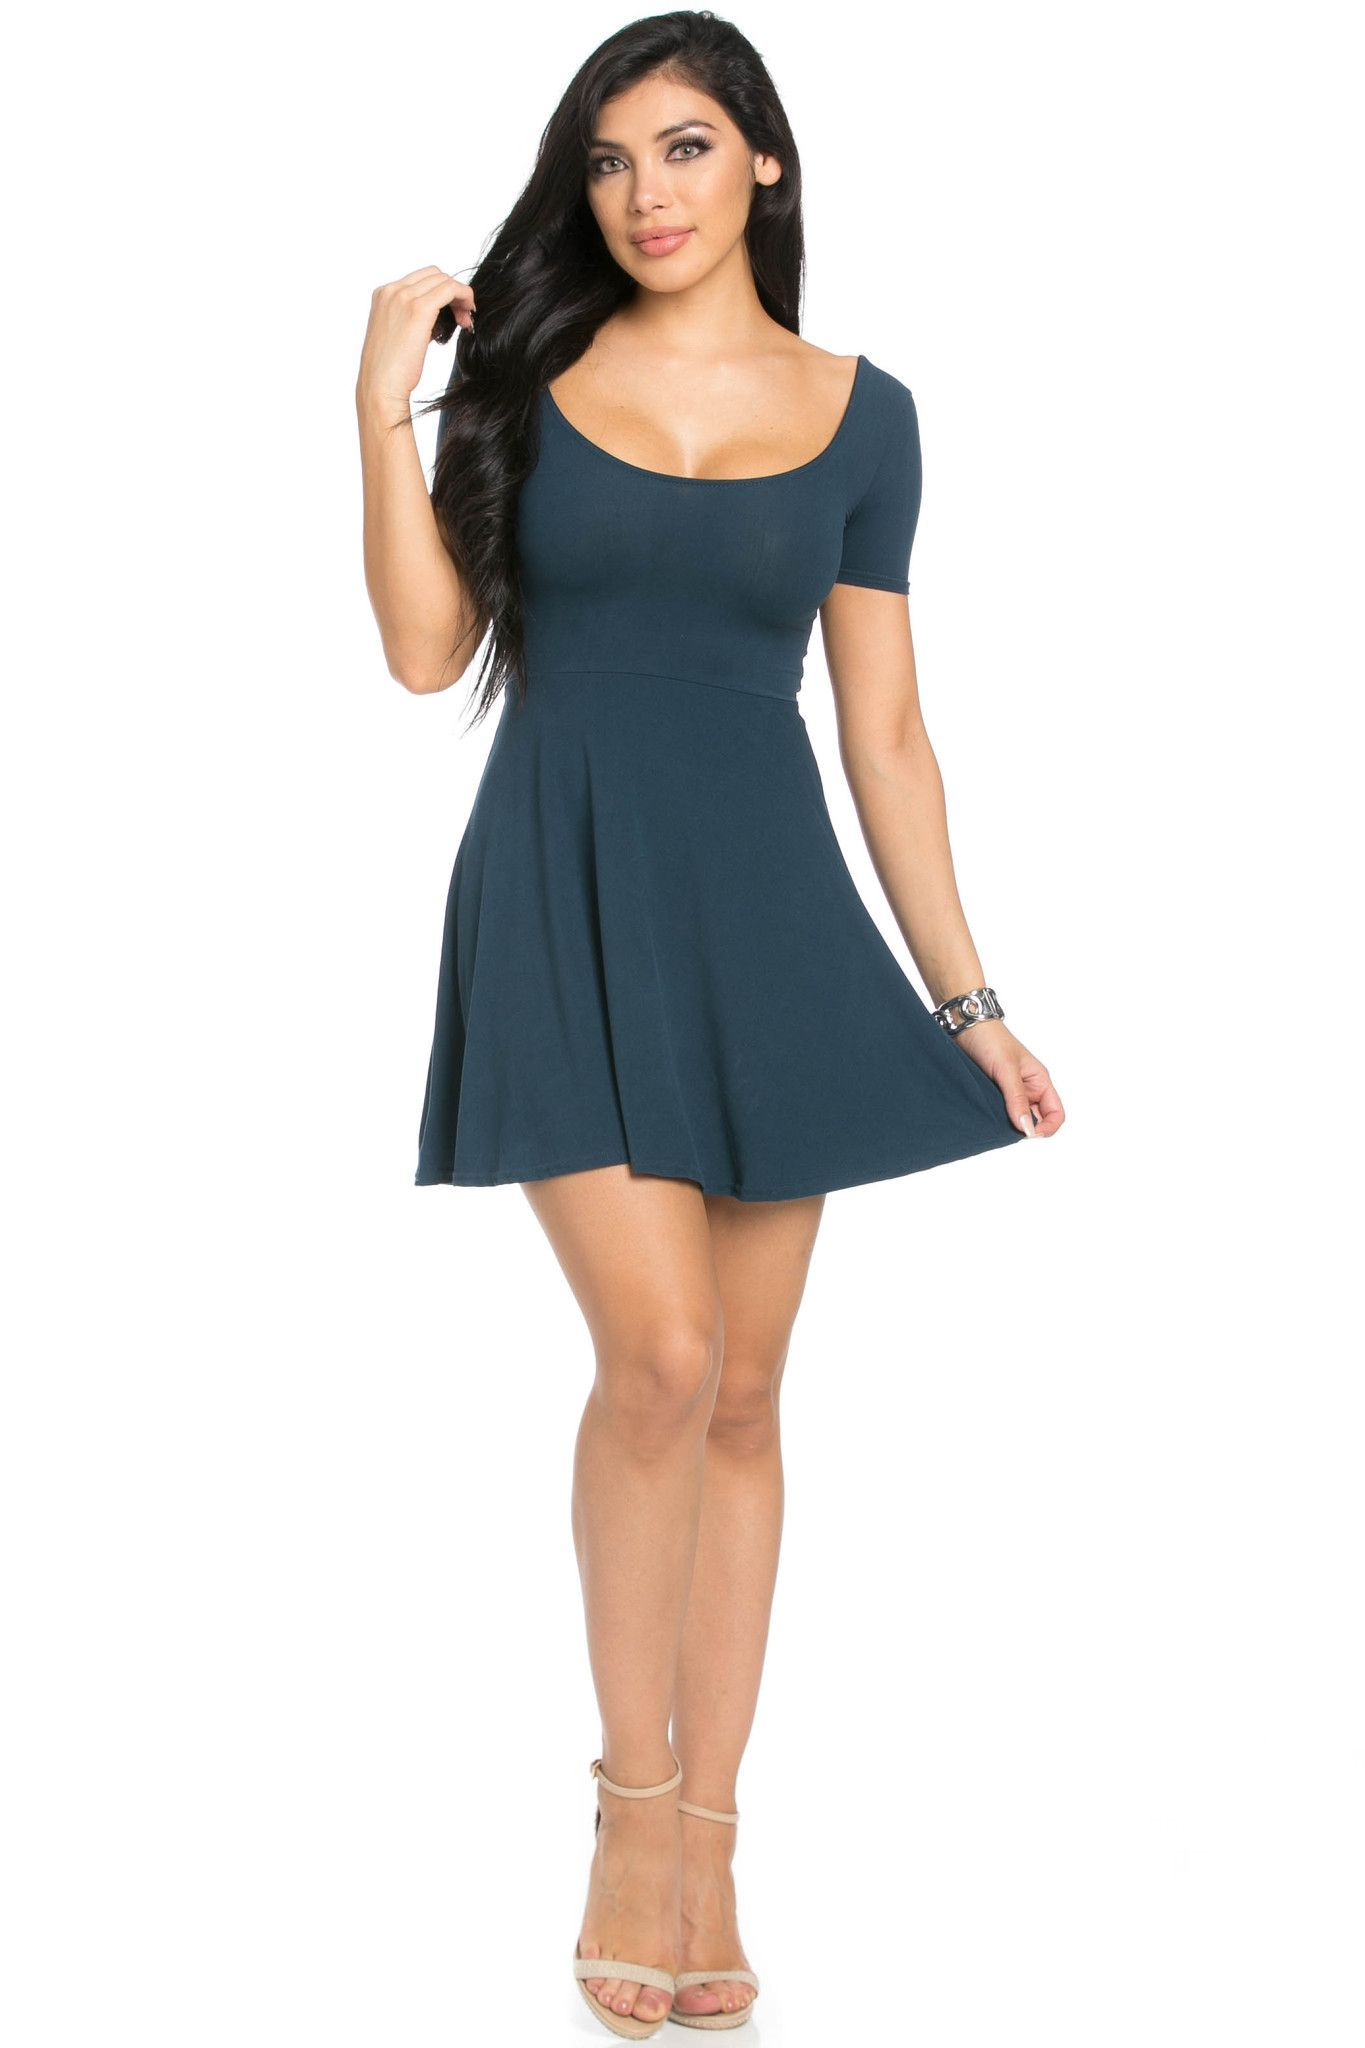 Micro suede indigo mini dress mini dresses minis and indigo blue